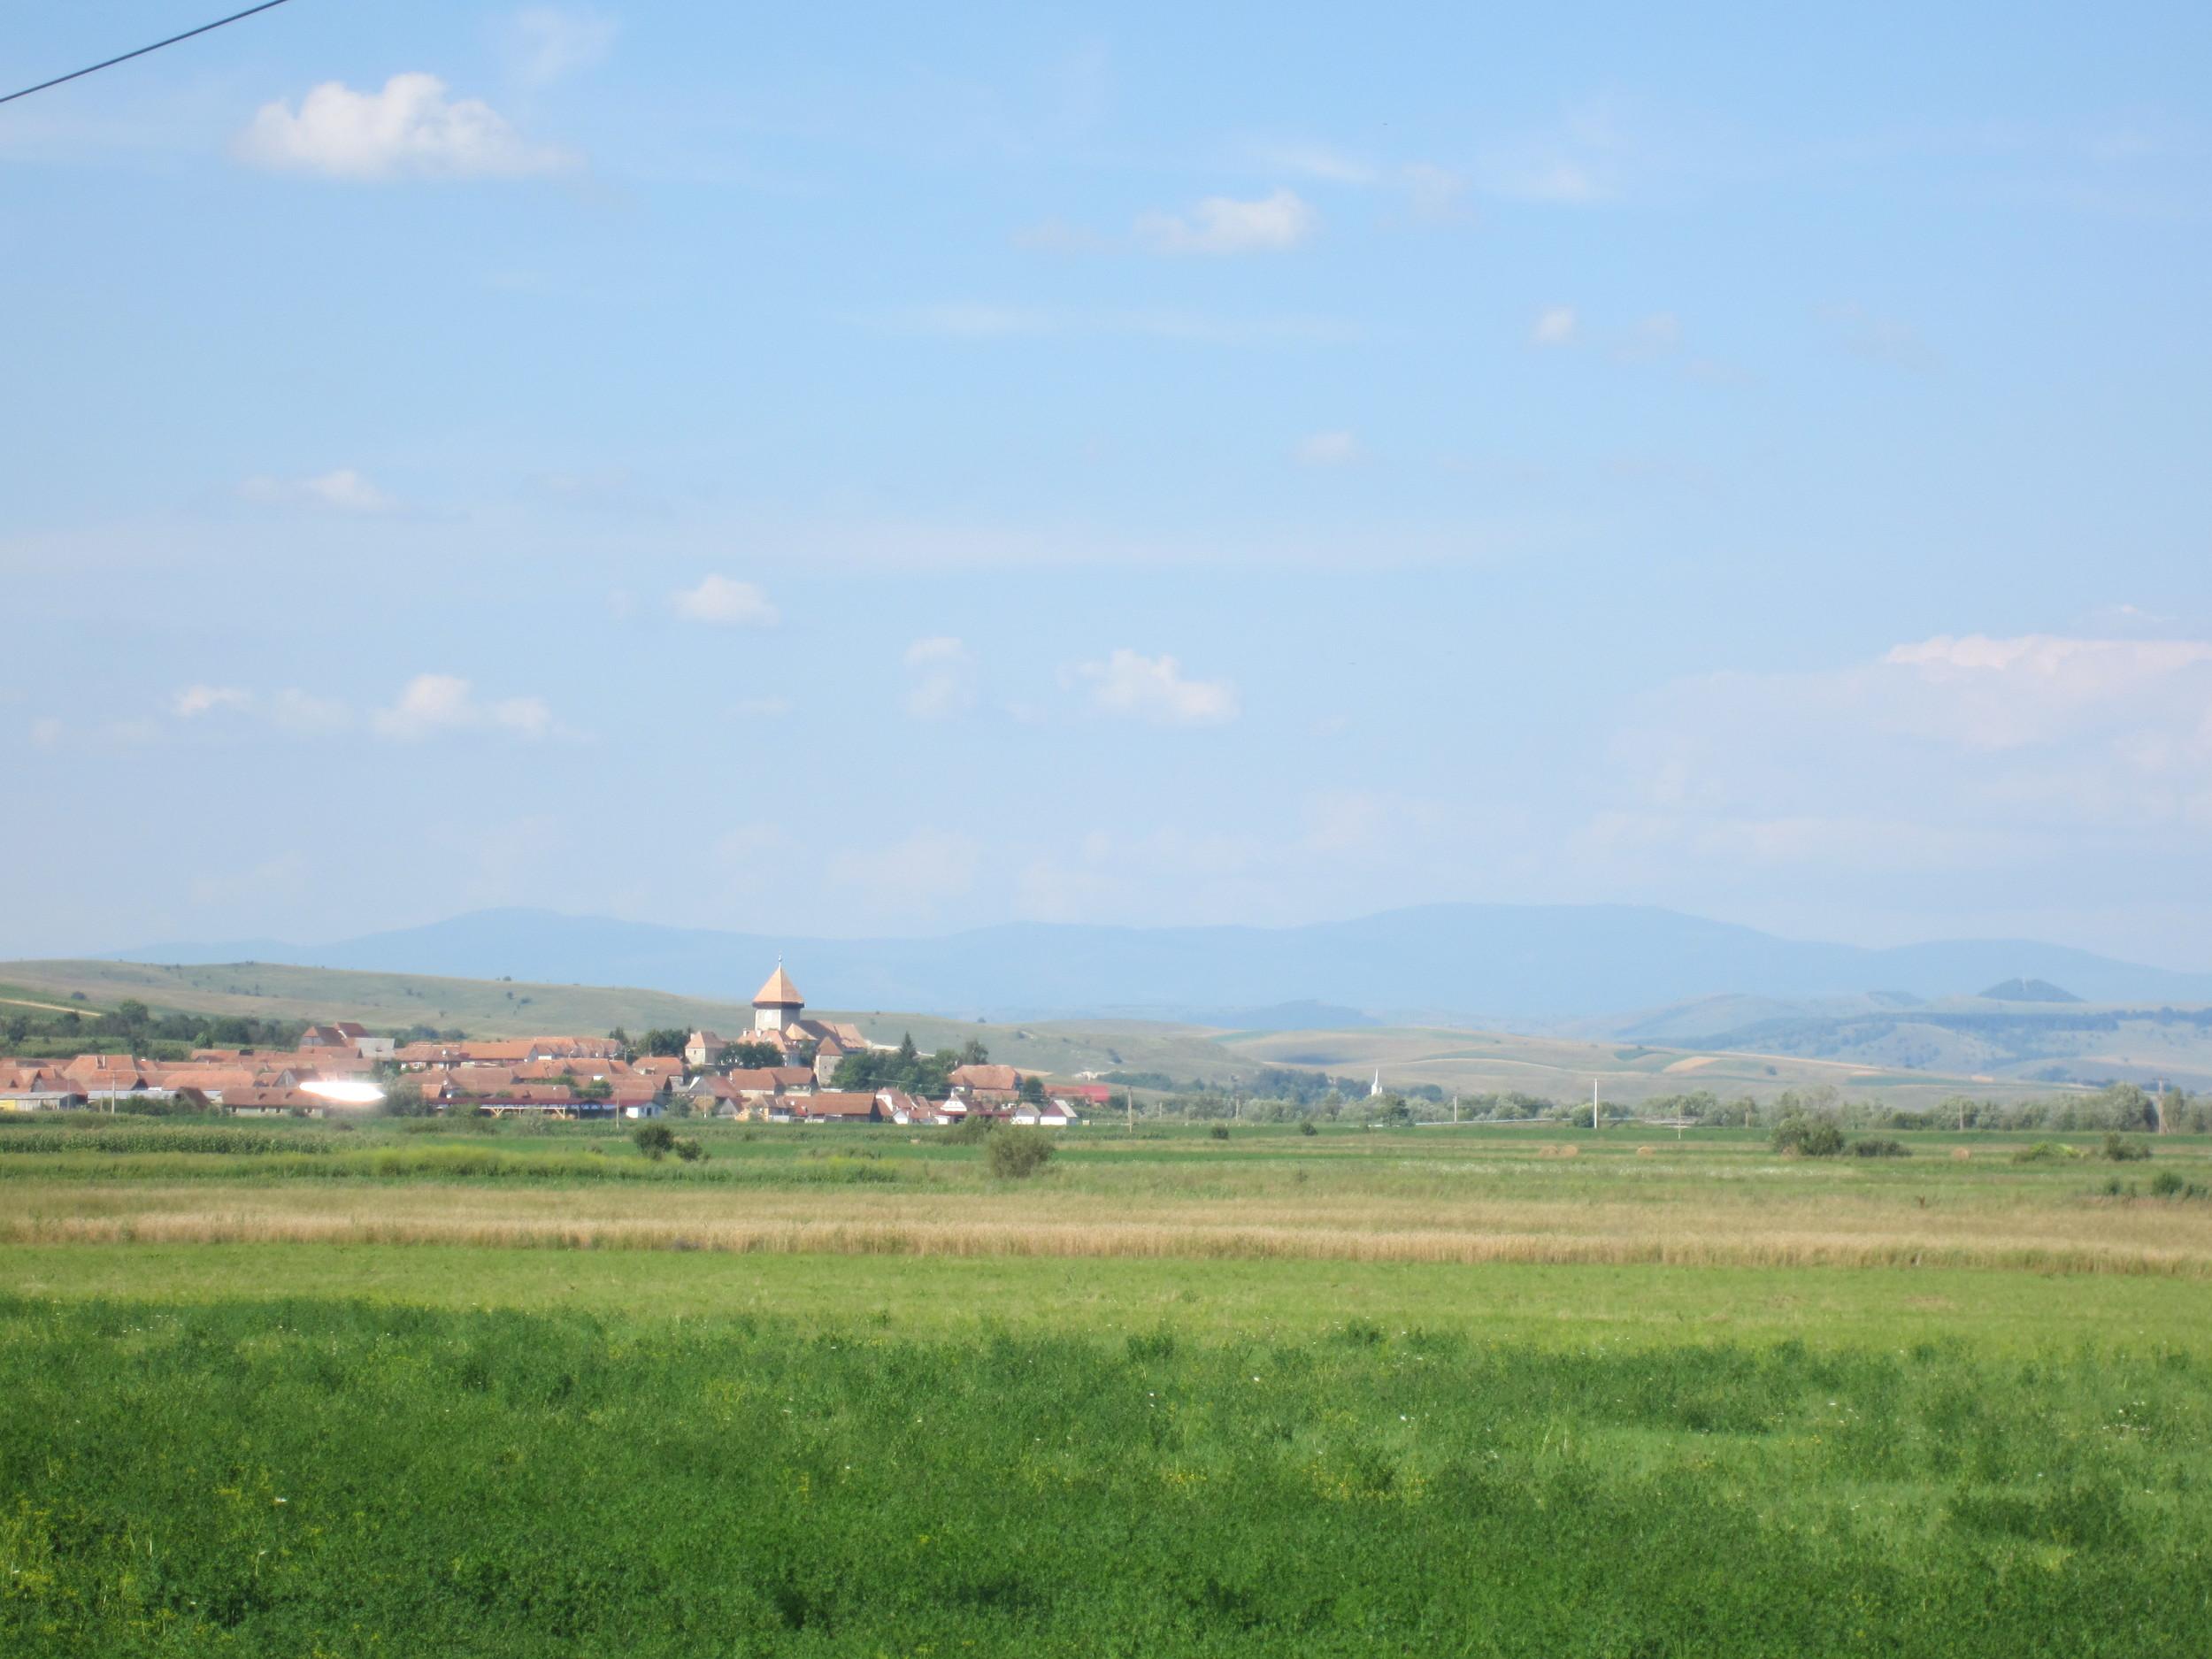 The Transylvanian countryside.